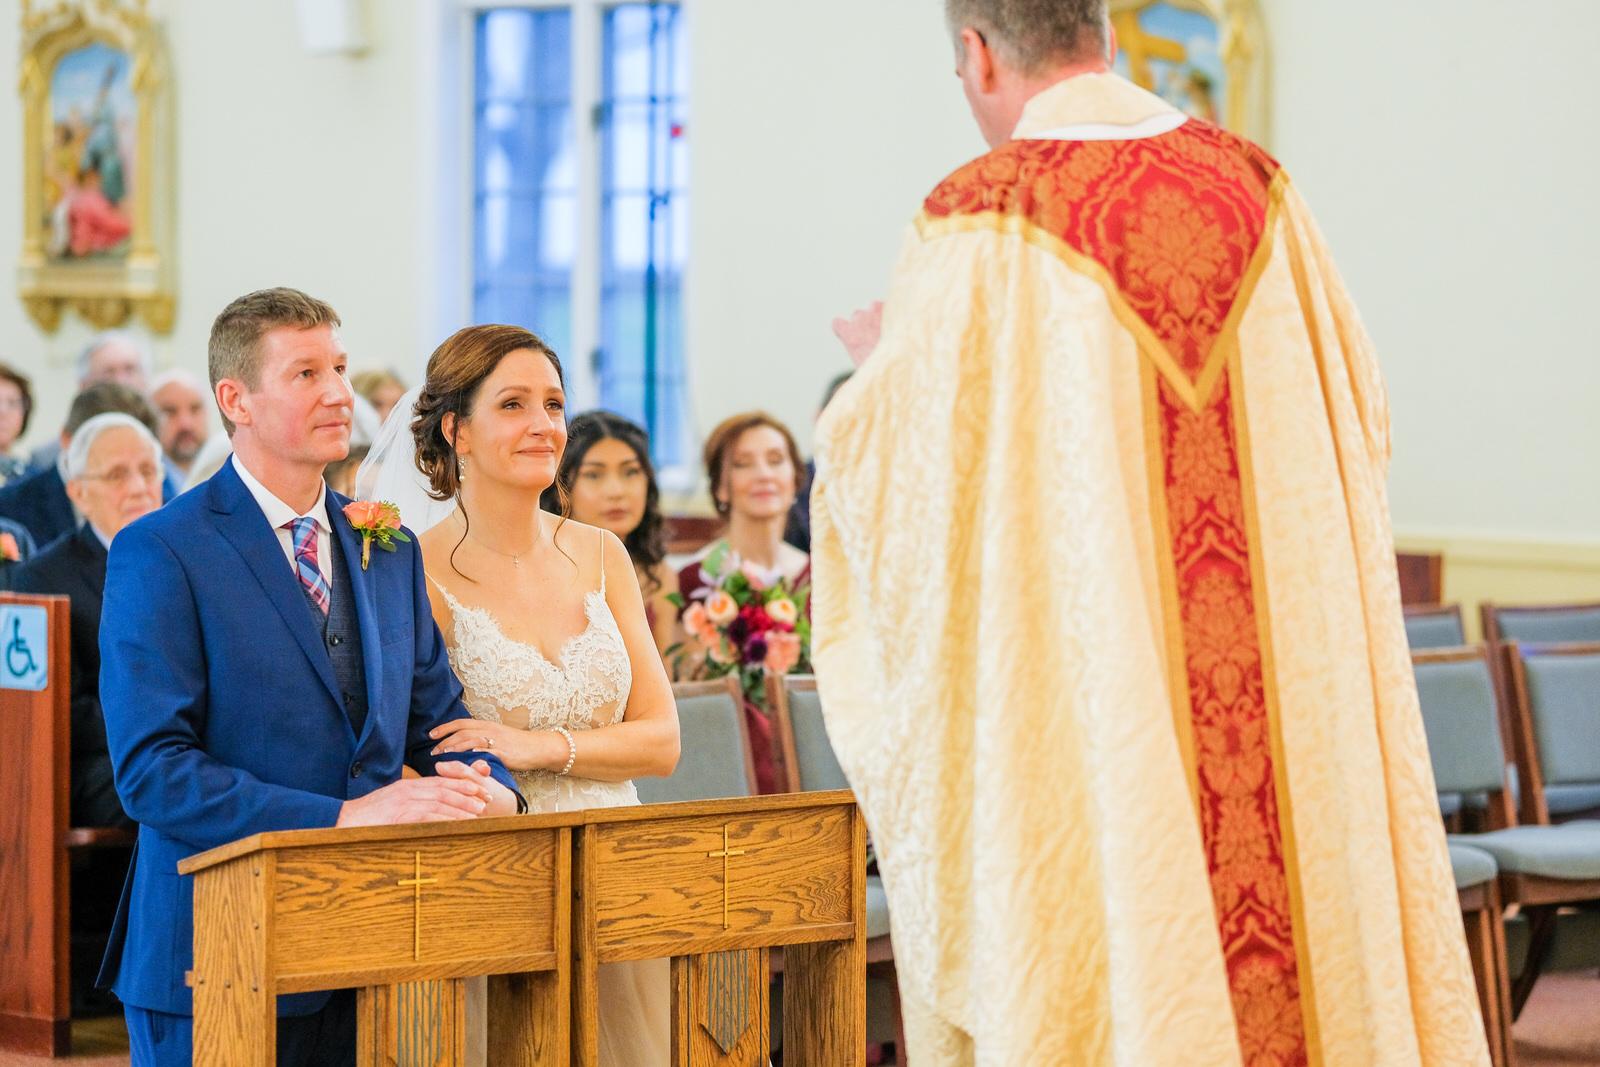 Zorvino-Vineyards-Fall-Wedding-Photography-313.jpg